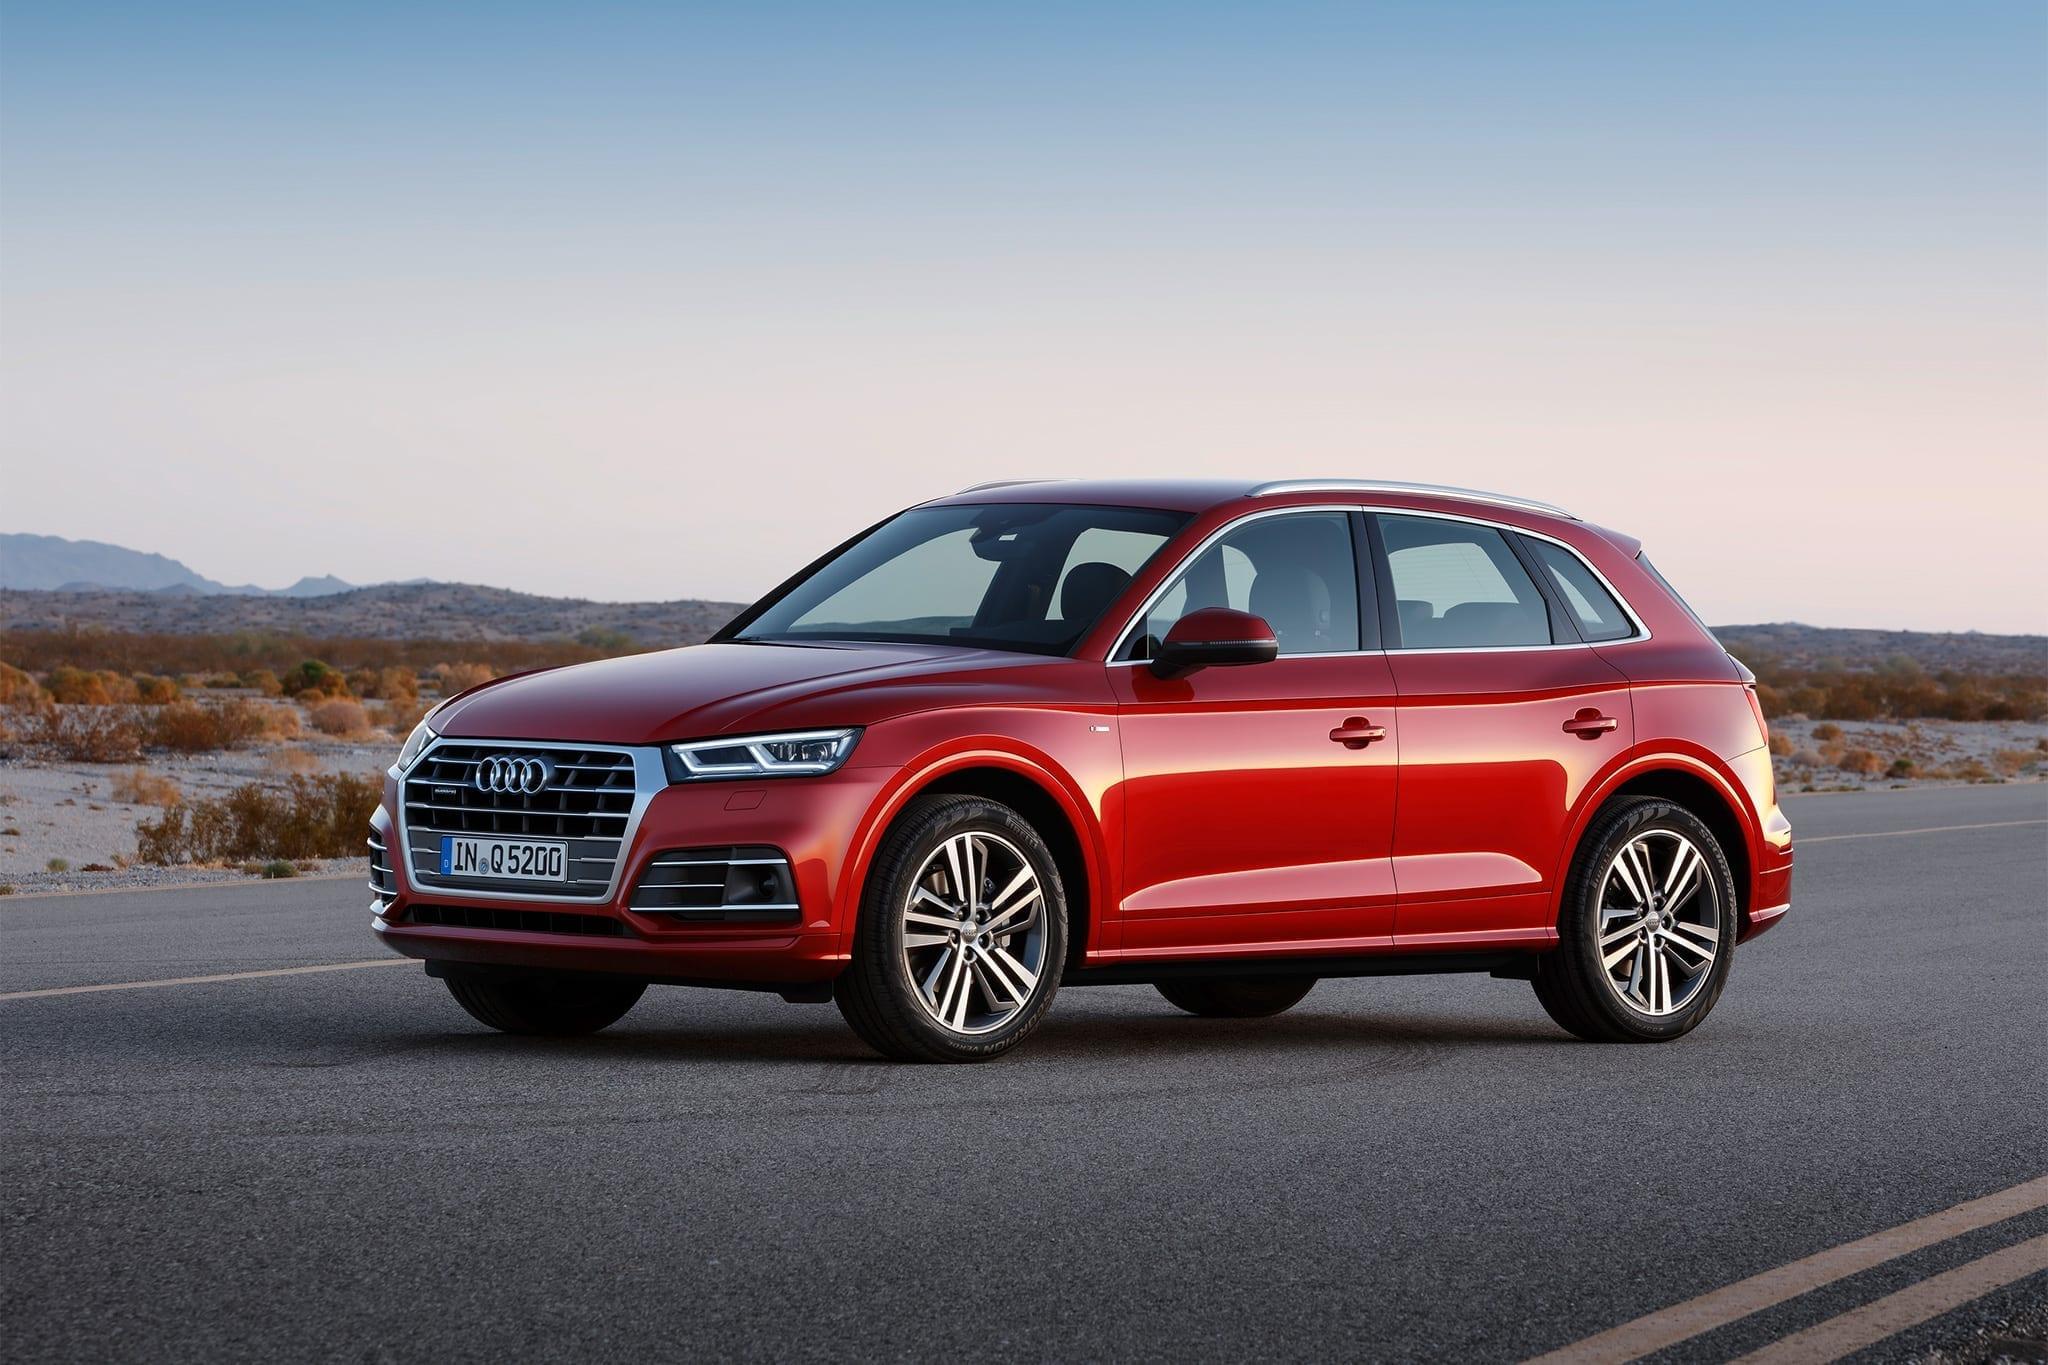 Kelebihan Audi Q5 Top Model Tahun Ini